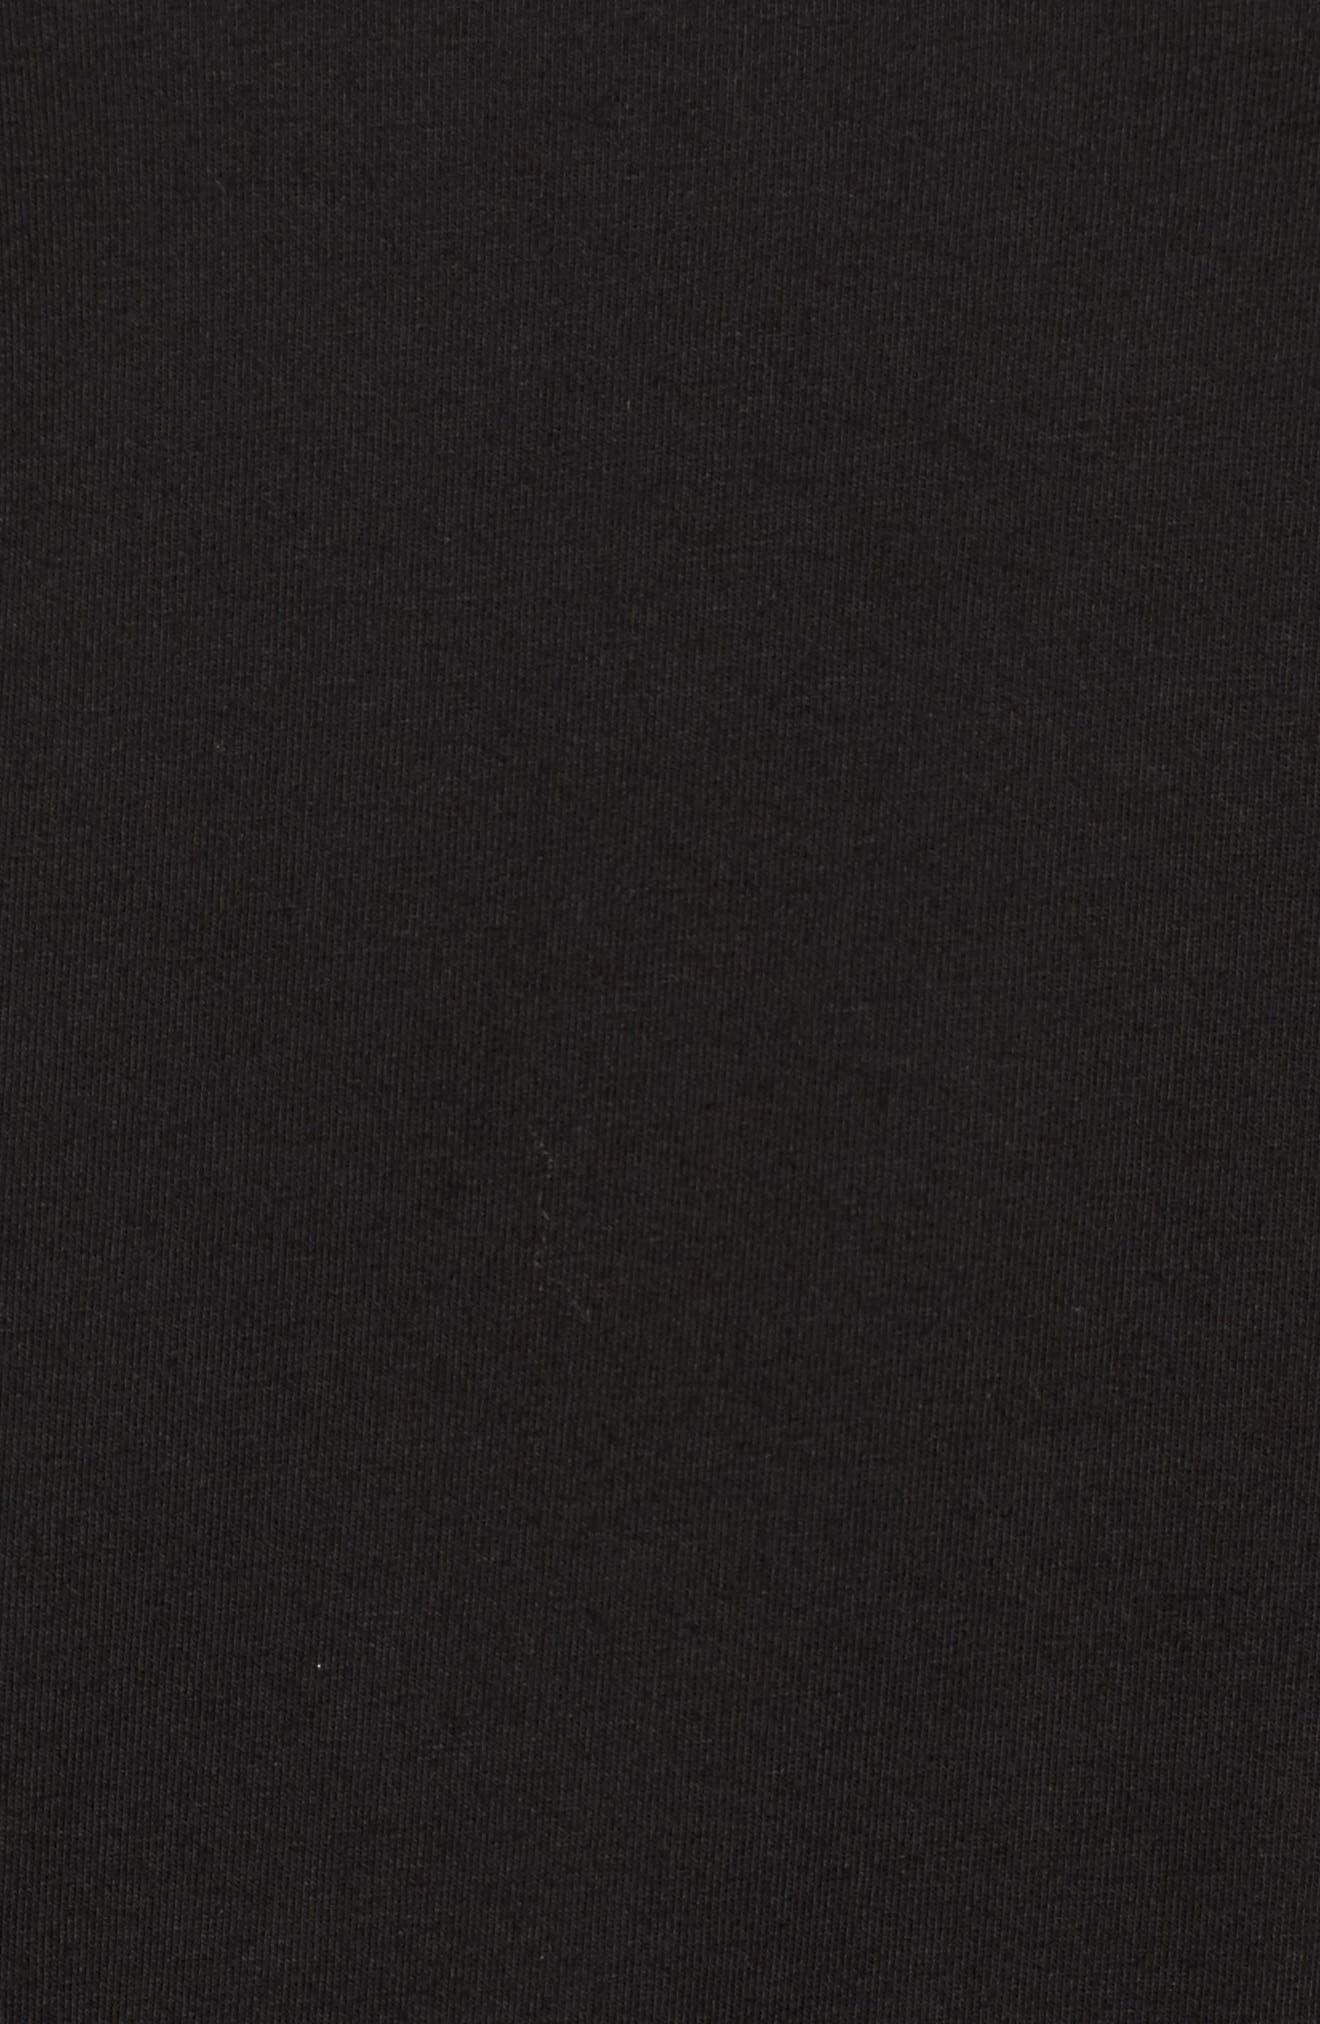 Ruffle Detail Sweatshirt,                             Alternate thumbnail 5, color,                             001